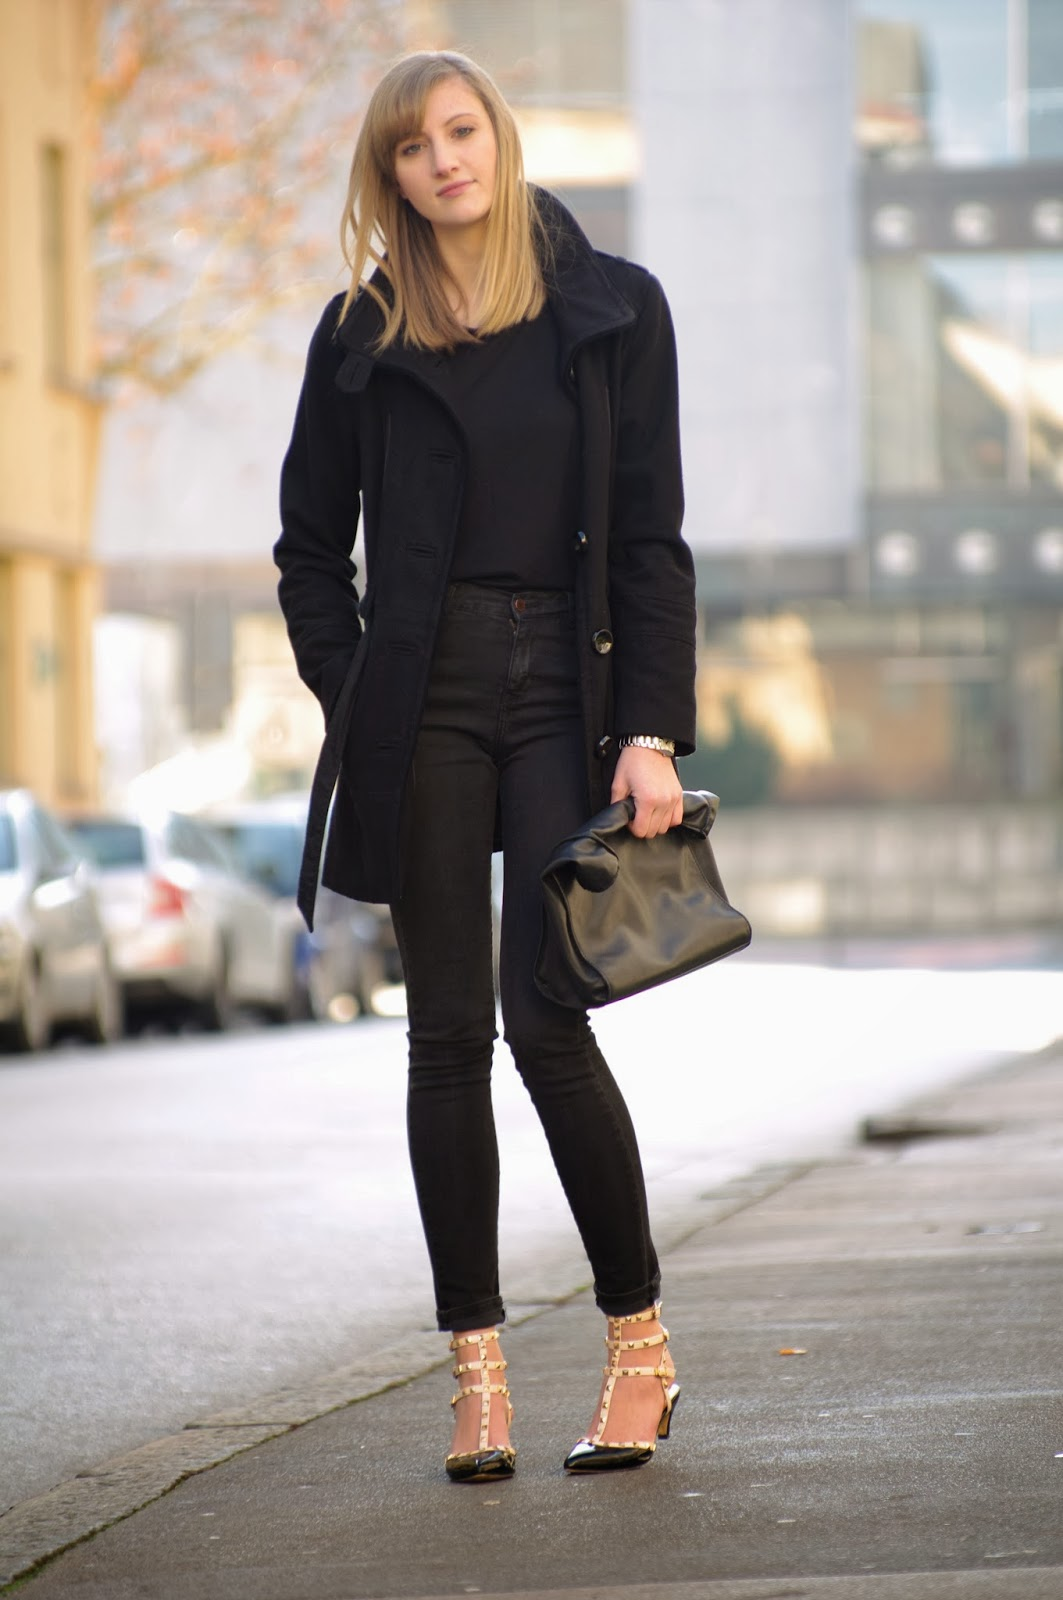 all black outfit, valentino rockstud lookalikes replica ebay, black coat ootd, high waisted denim pants zara jeans, style blogger, fashion blog blogger, slovenski blogerji, modni blog